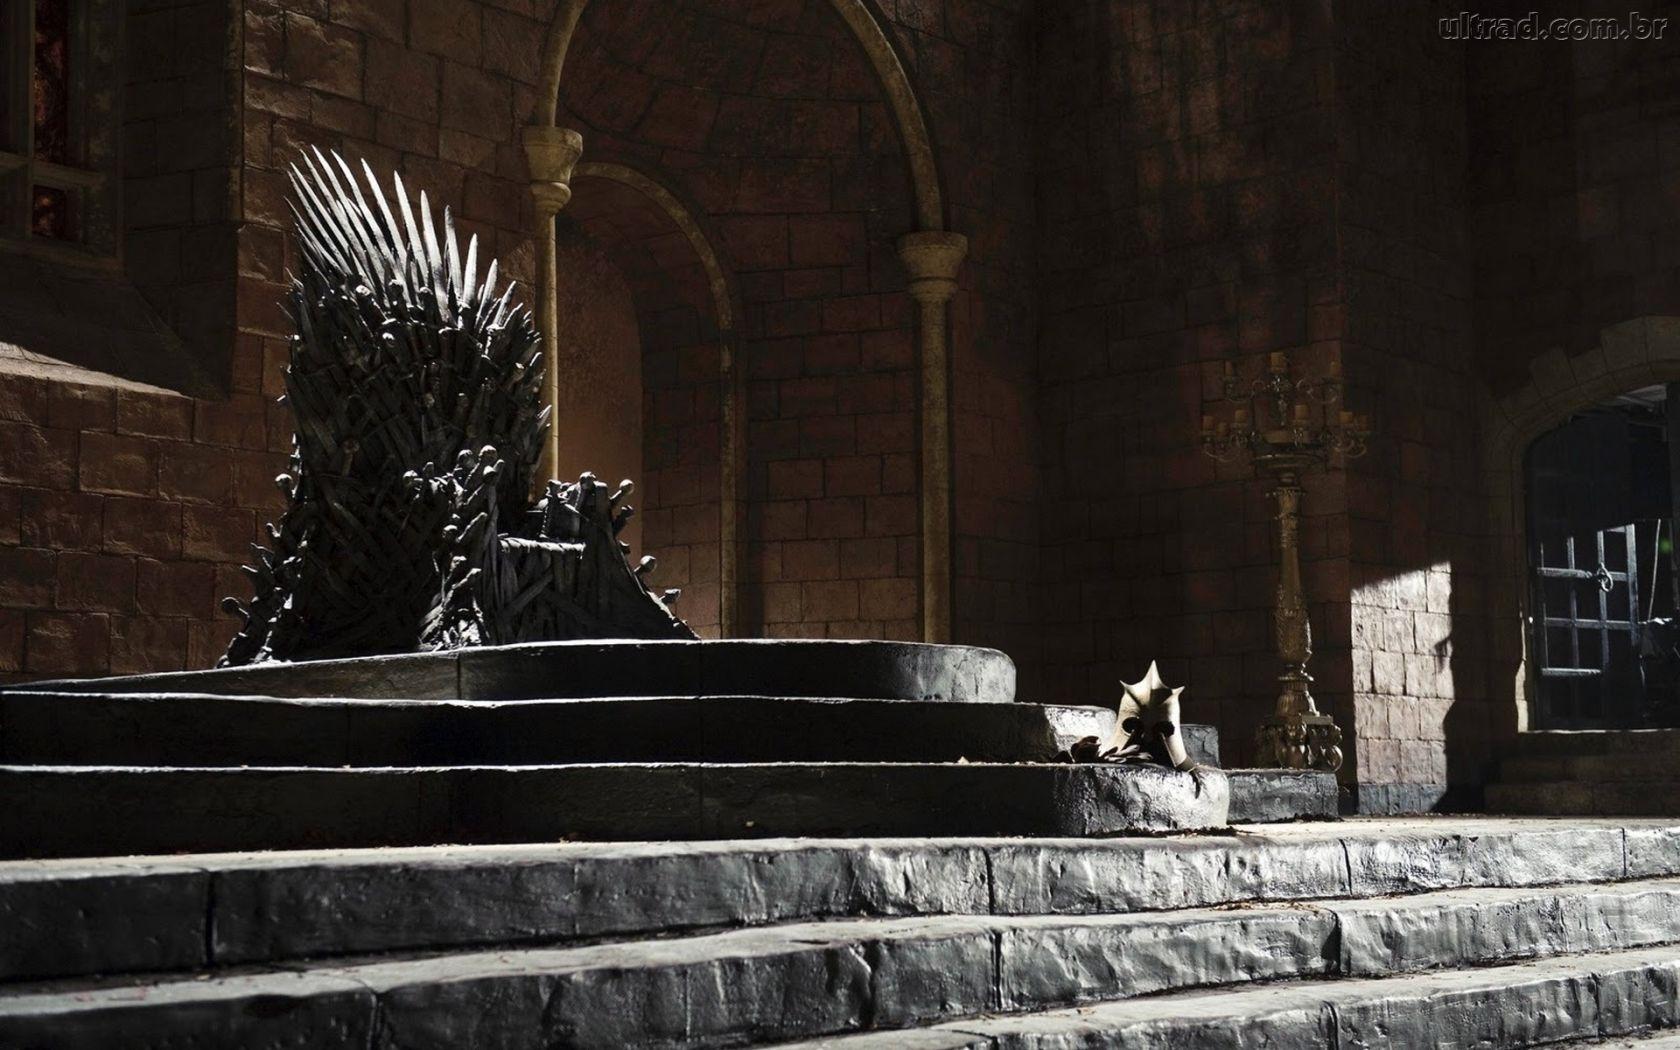 Game Of Thrones Trono De Ferro Chega A Sao Paulo Na Semana De